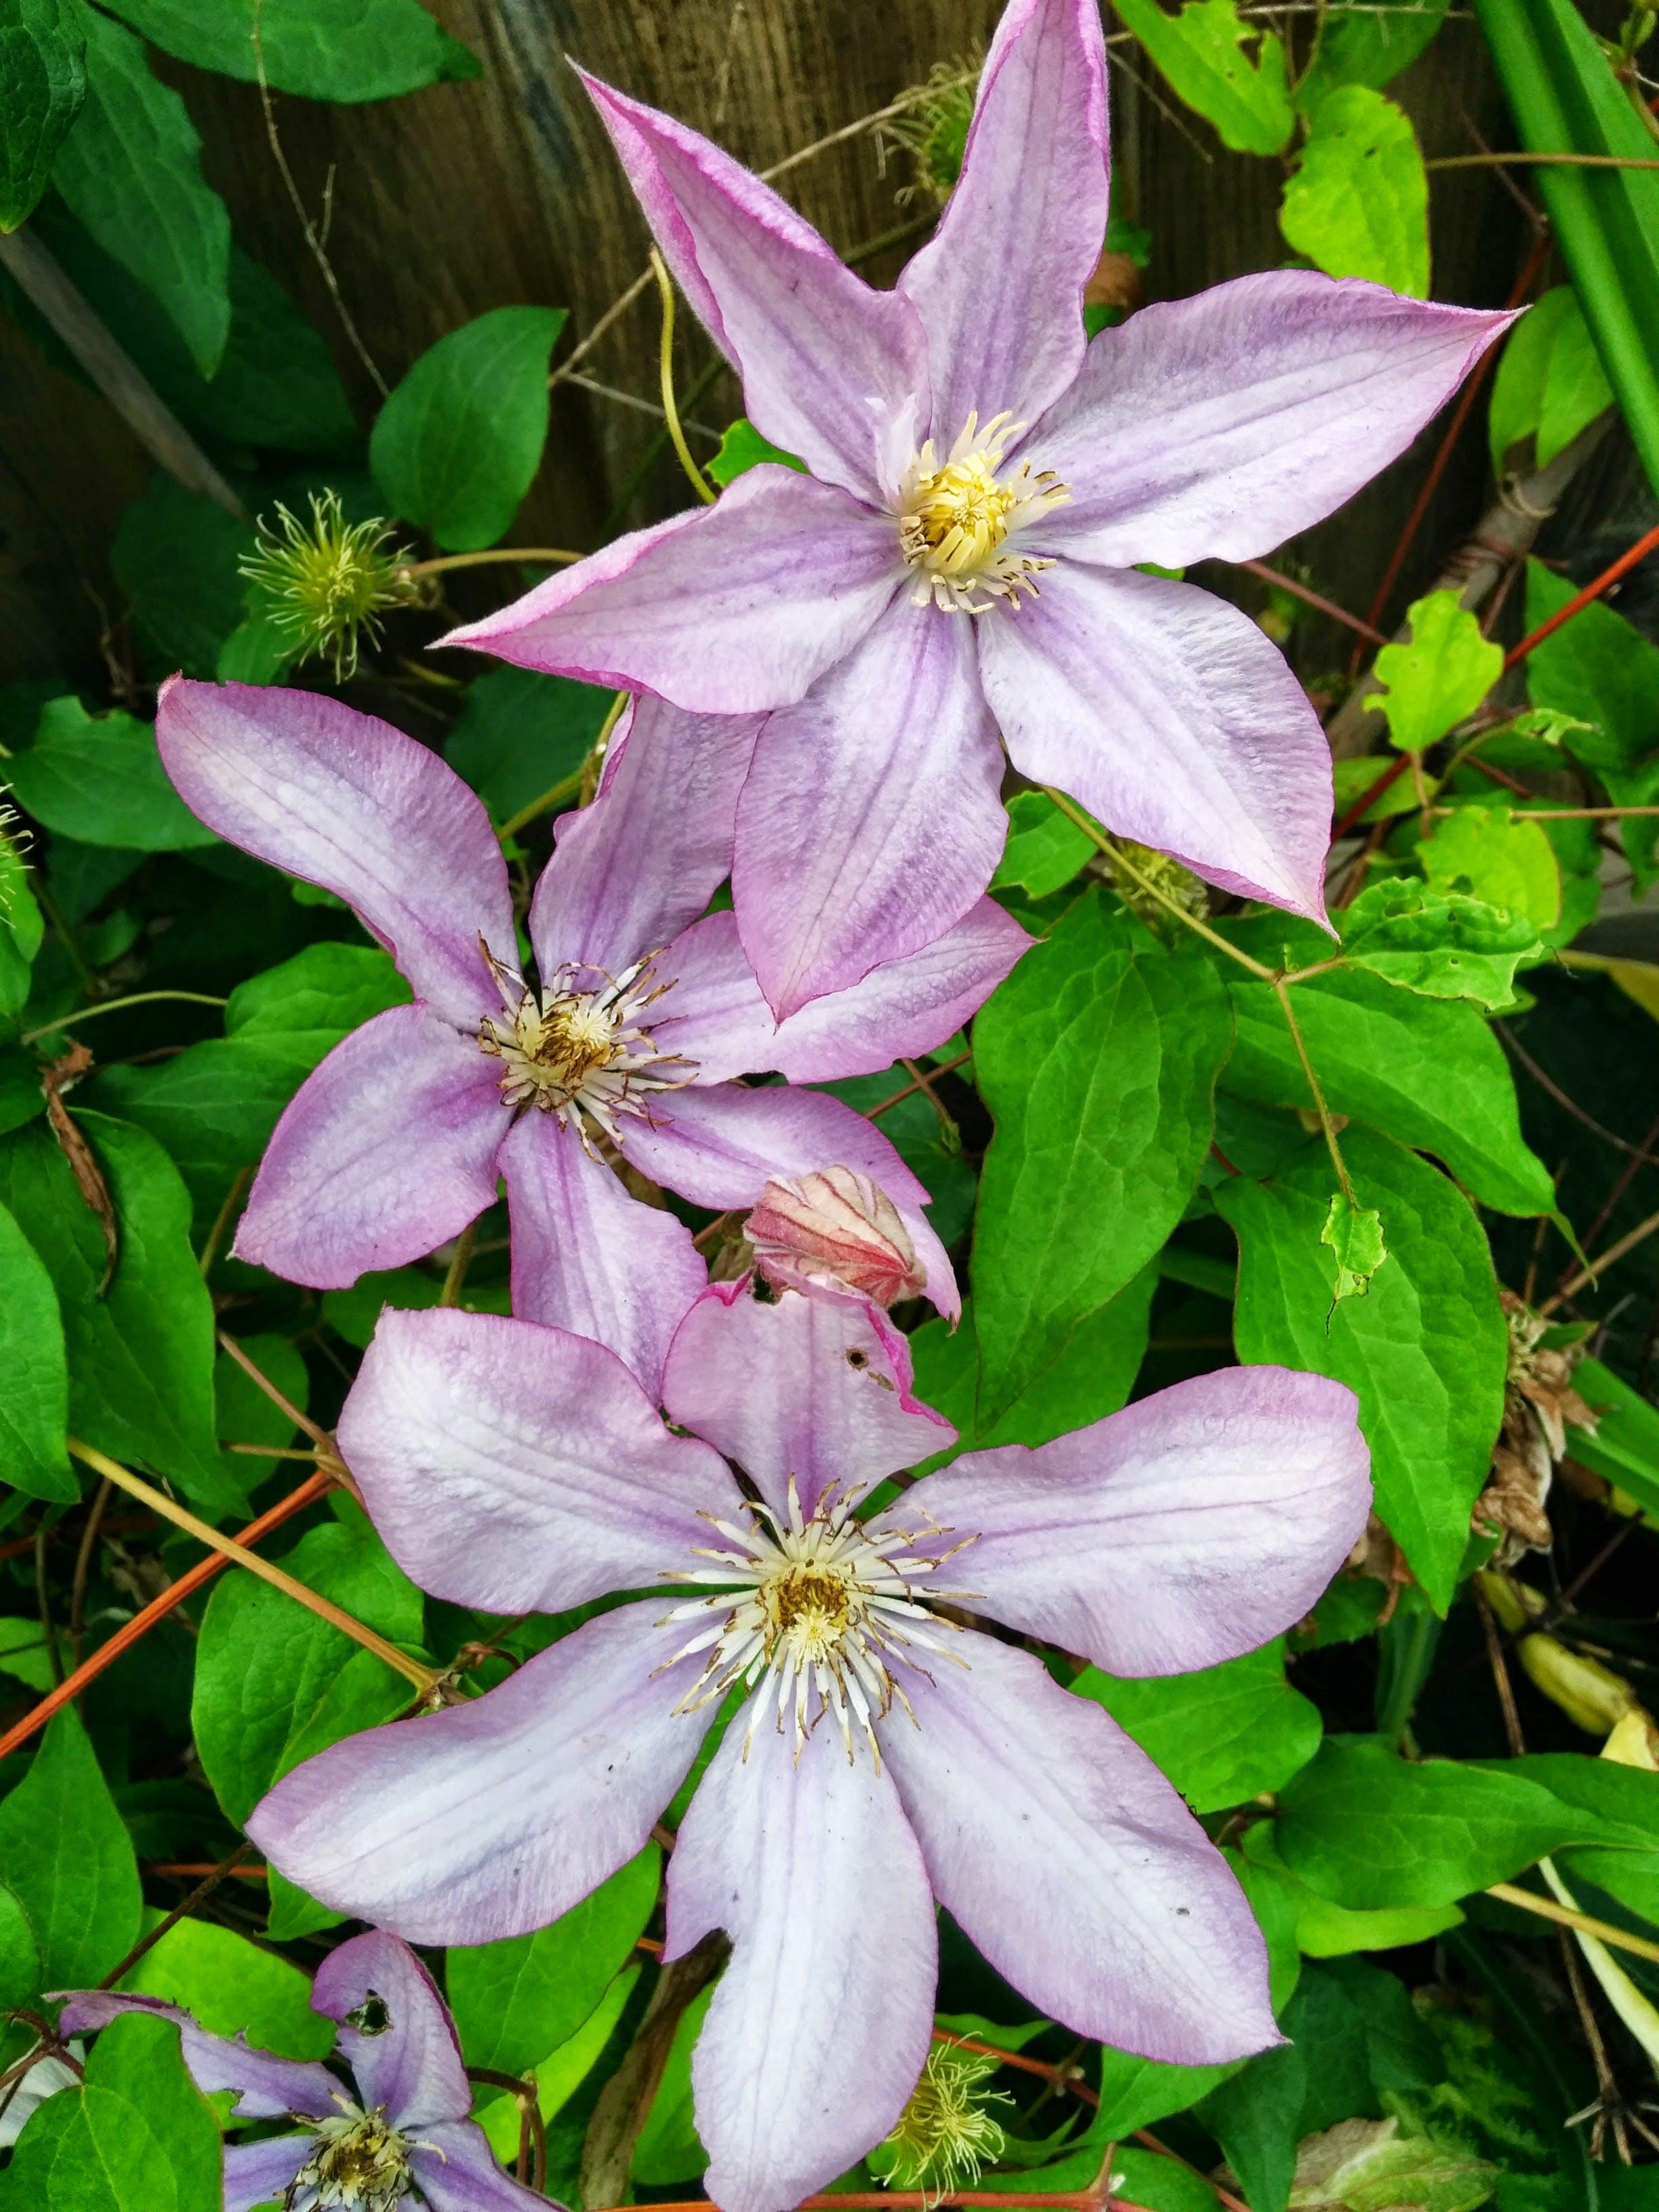 Free stock photo of Clematis 'Jackmanii' flowers, flowers, garden, purple flowers